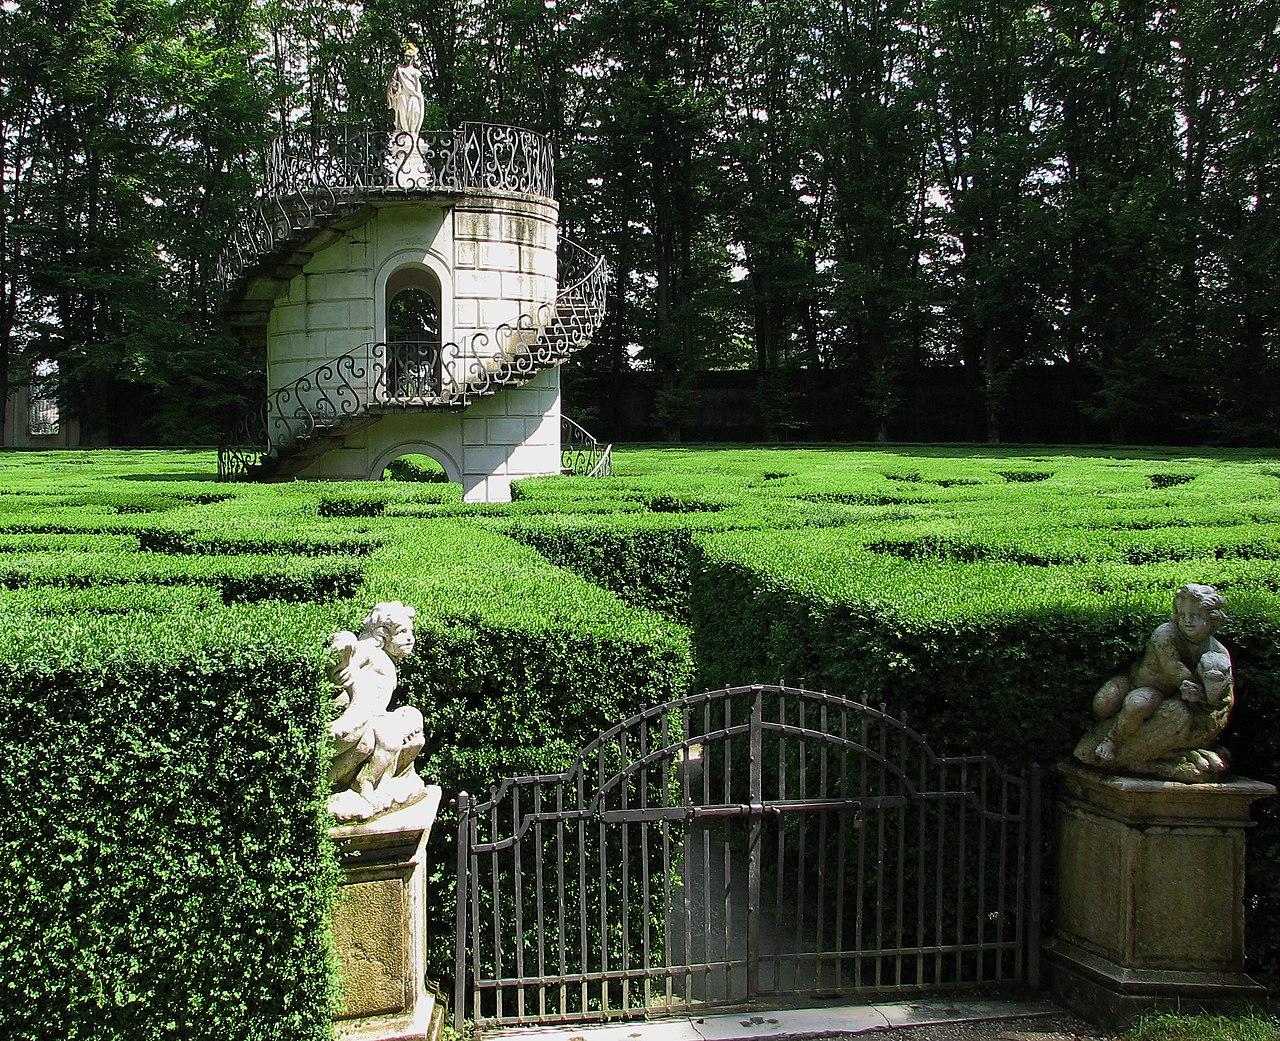 https://upload.wikimedia.org/wikipedia/commons/thumb/7/78/Villa_Pisani_Labirinto.jpg/1280px-Villa_Pisani_Labirinto.jpg